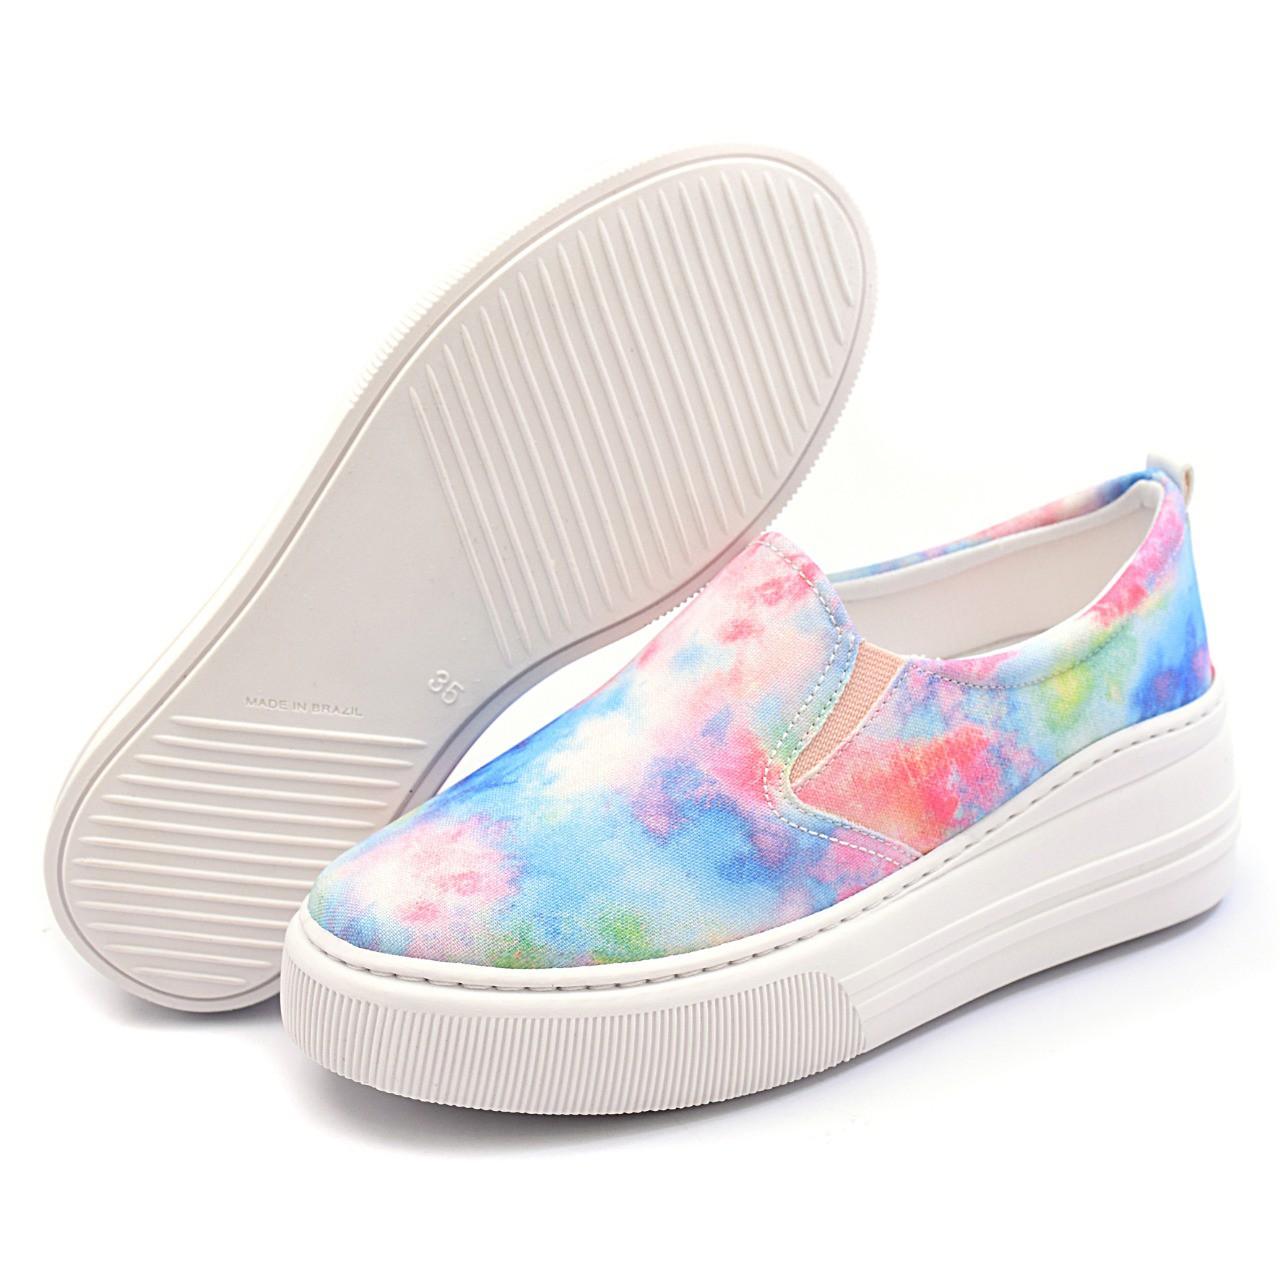 Slip On Colorido Gommix Shoes 089 Tie Dye Sola Alta